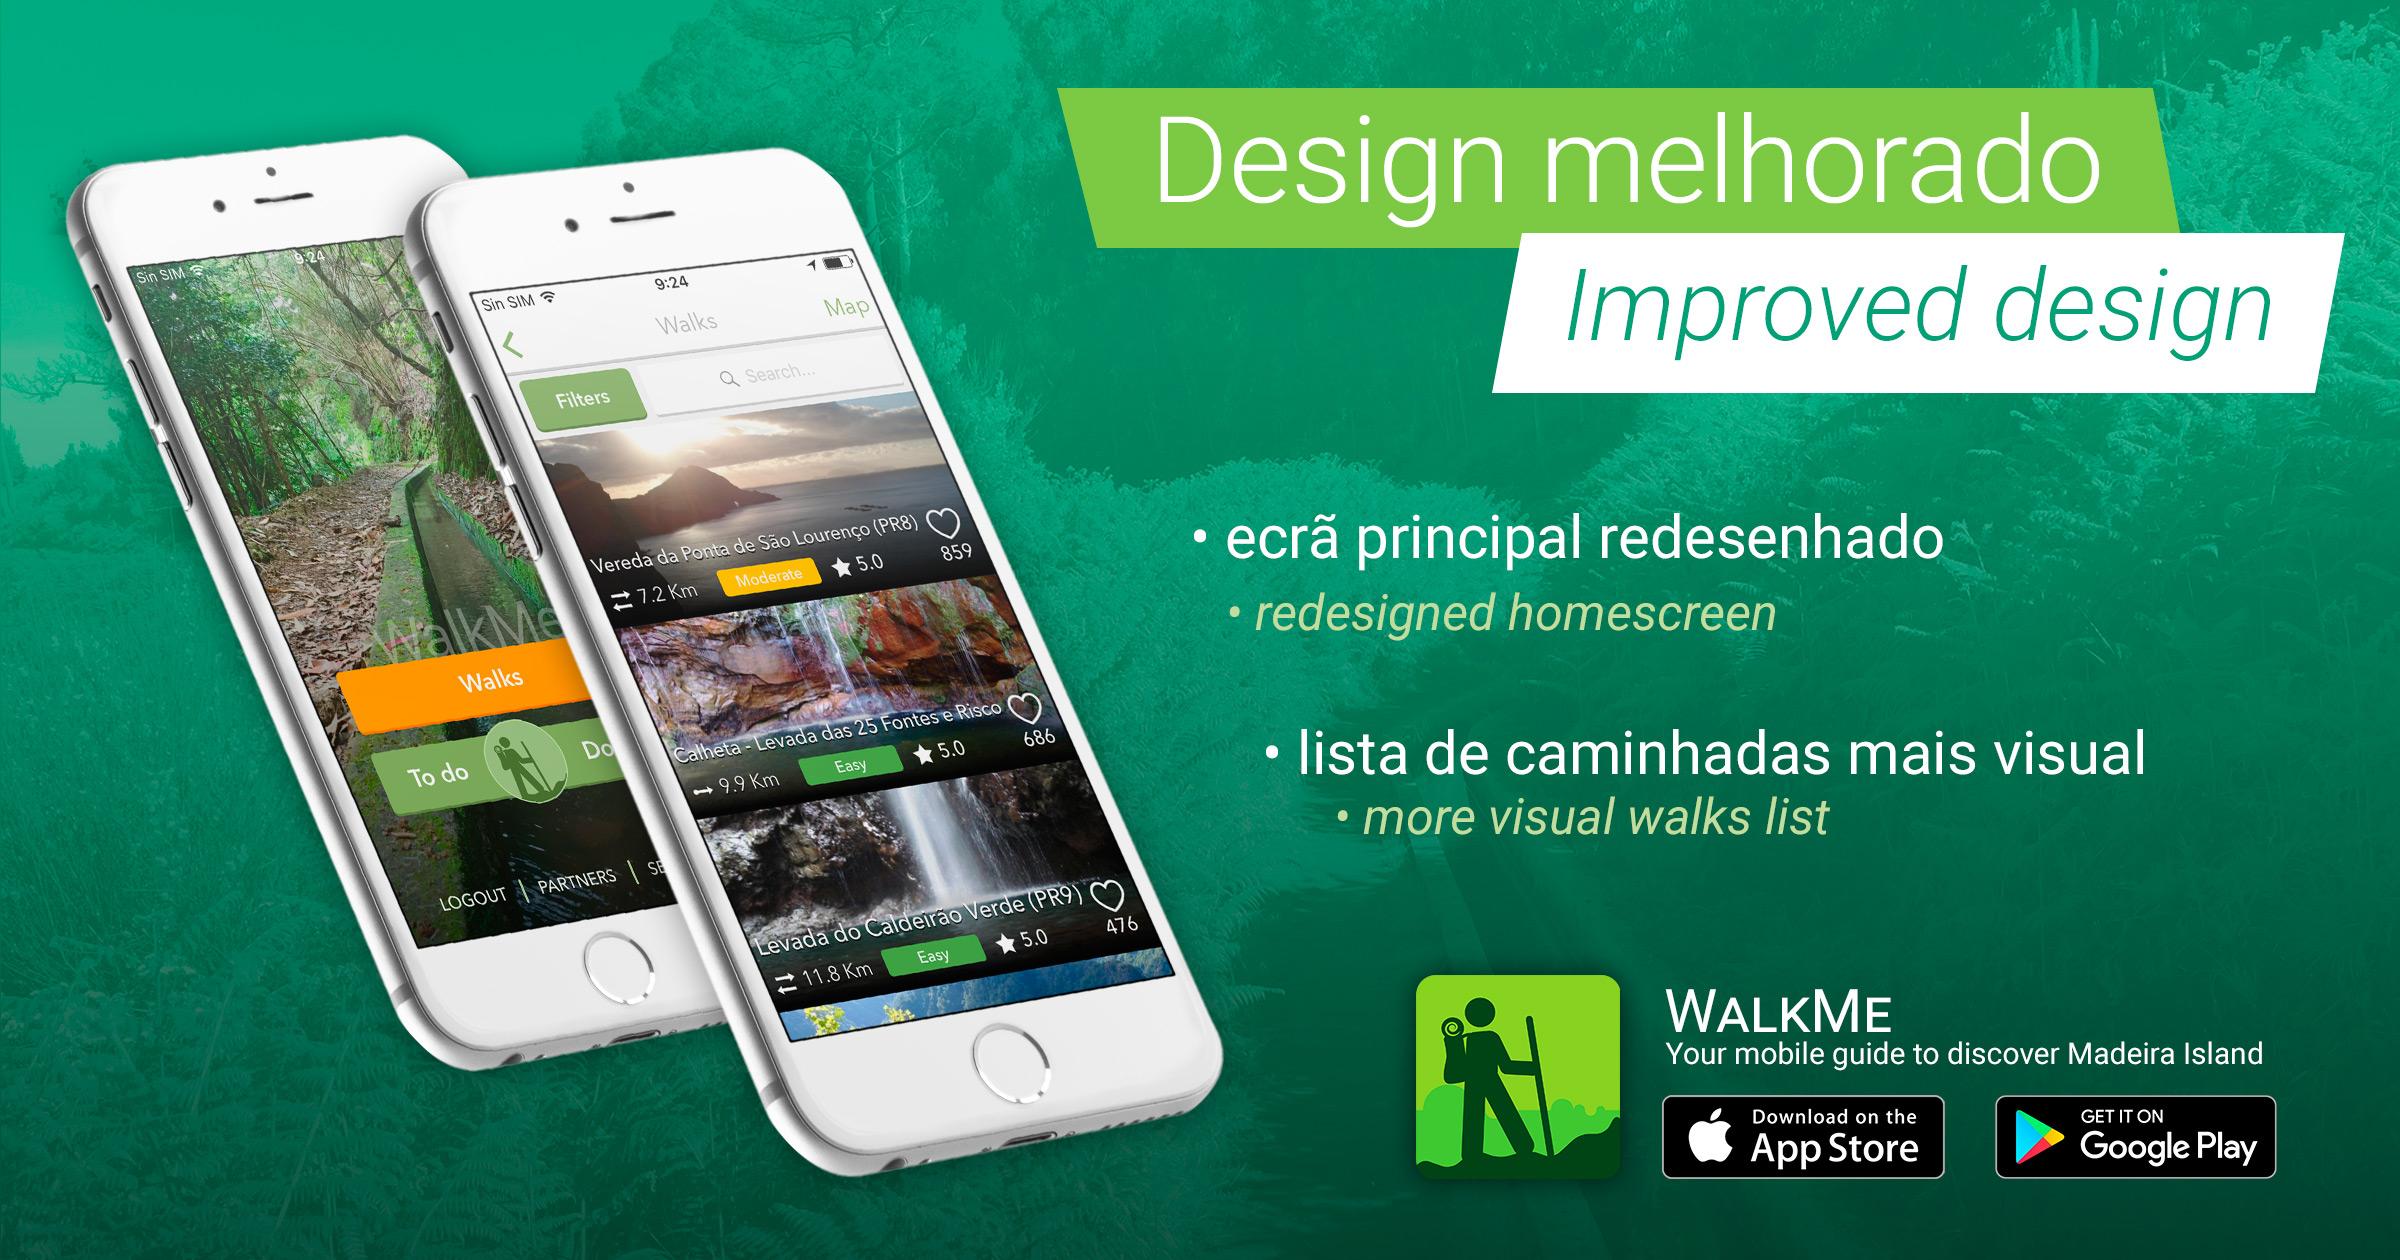 WalkMe App Madeira